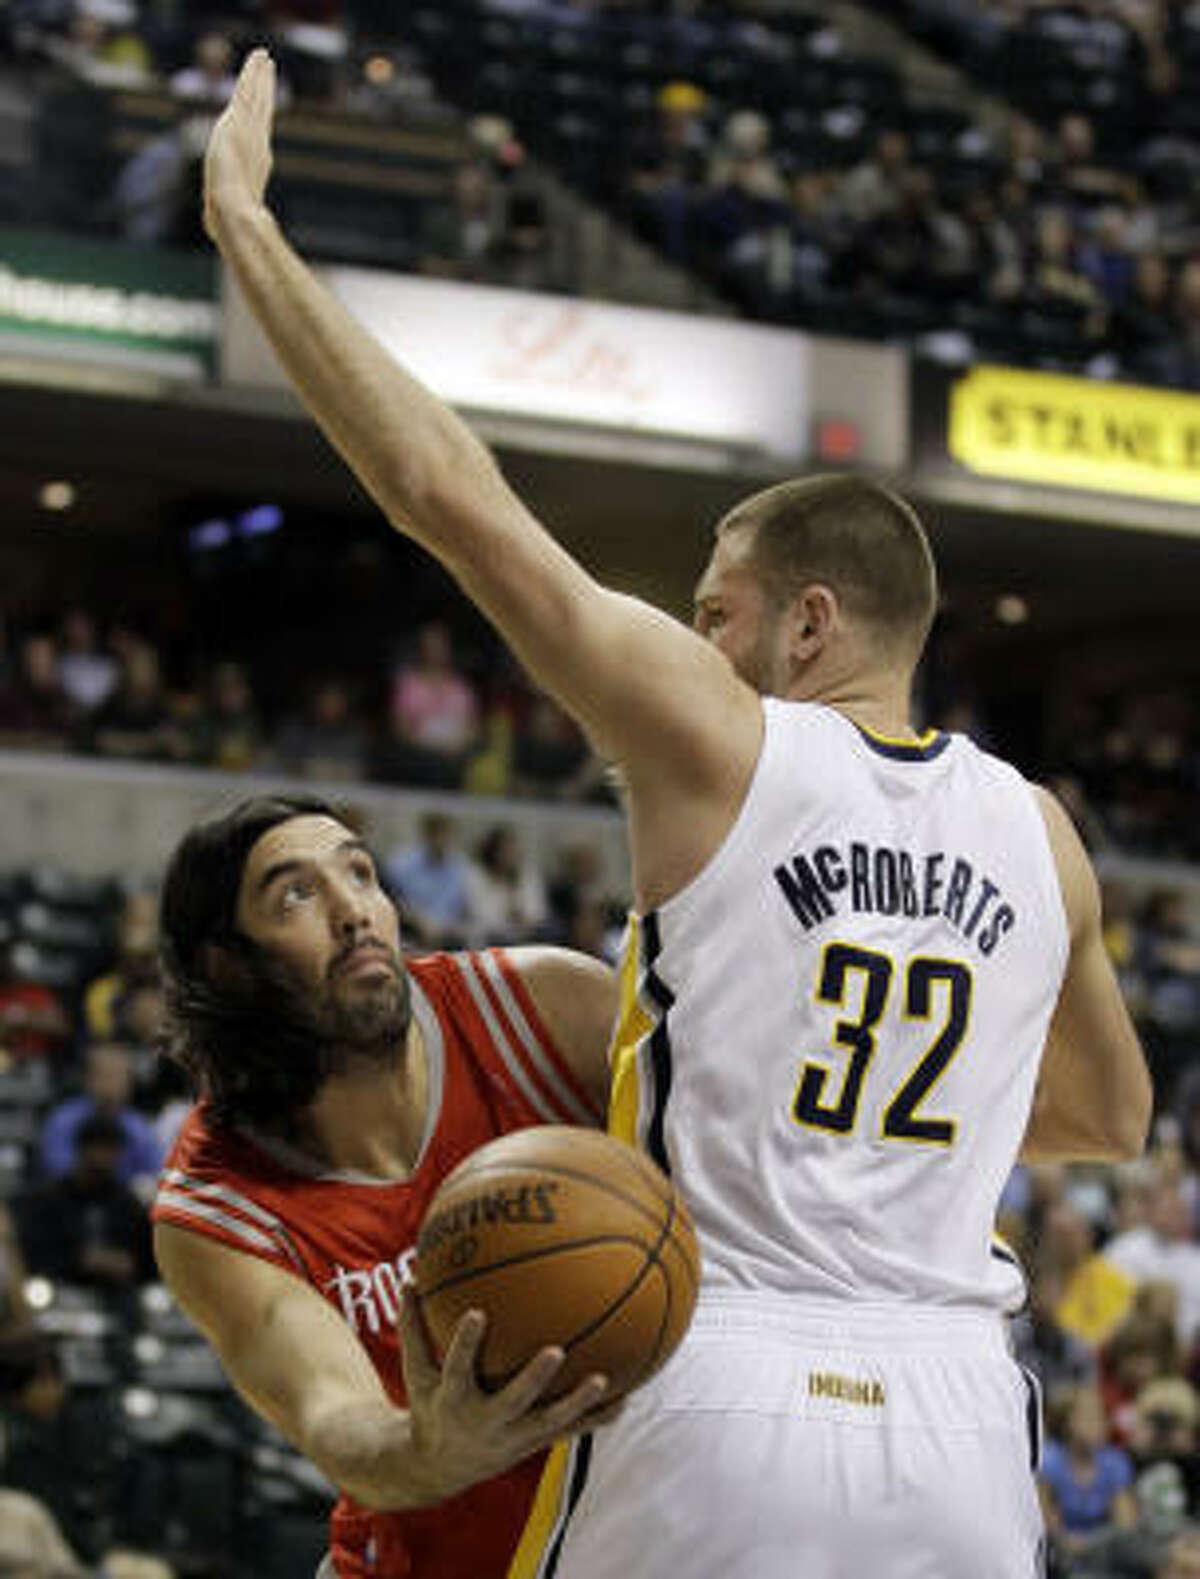 Rockets forward Luis Scola, left, puts up a shot against Pacers forward Josh McRoberts.